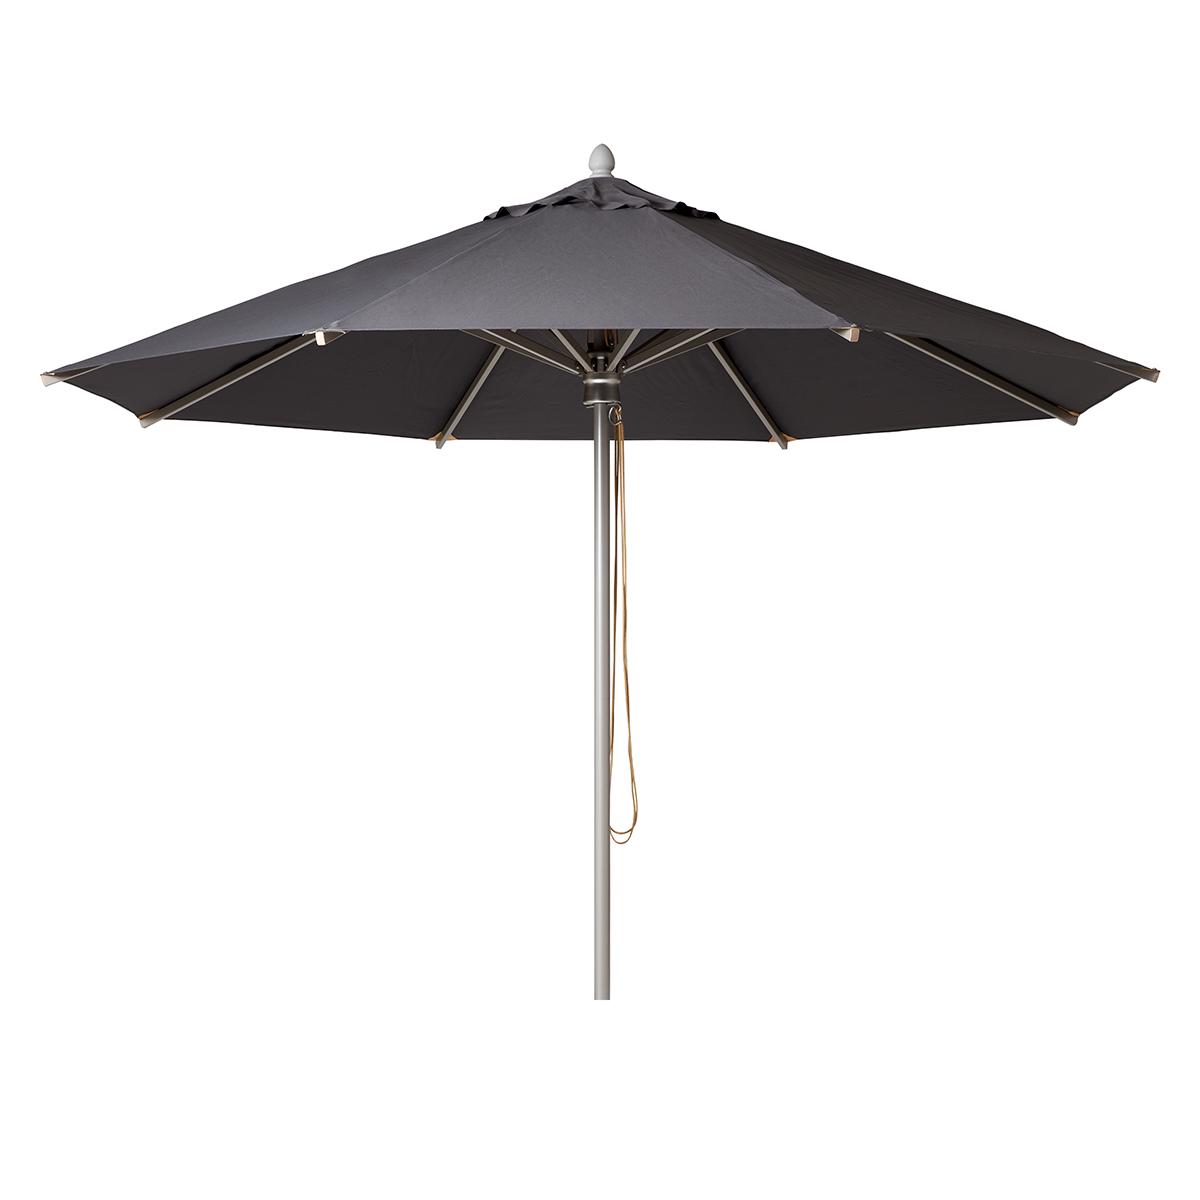 Image of   Cinas parasol - Rimini - Grå